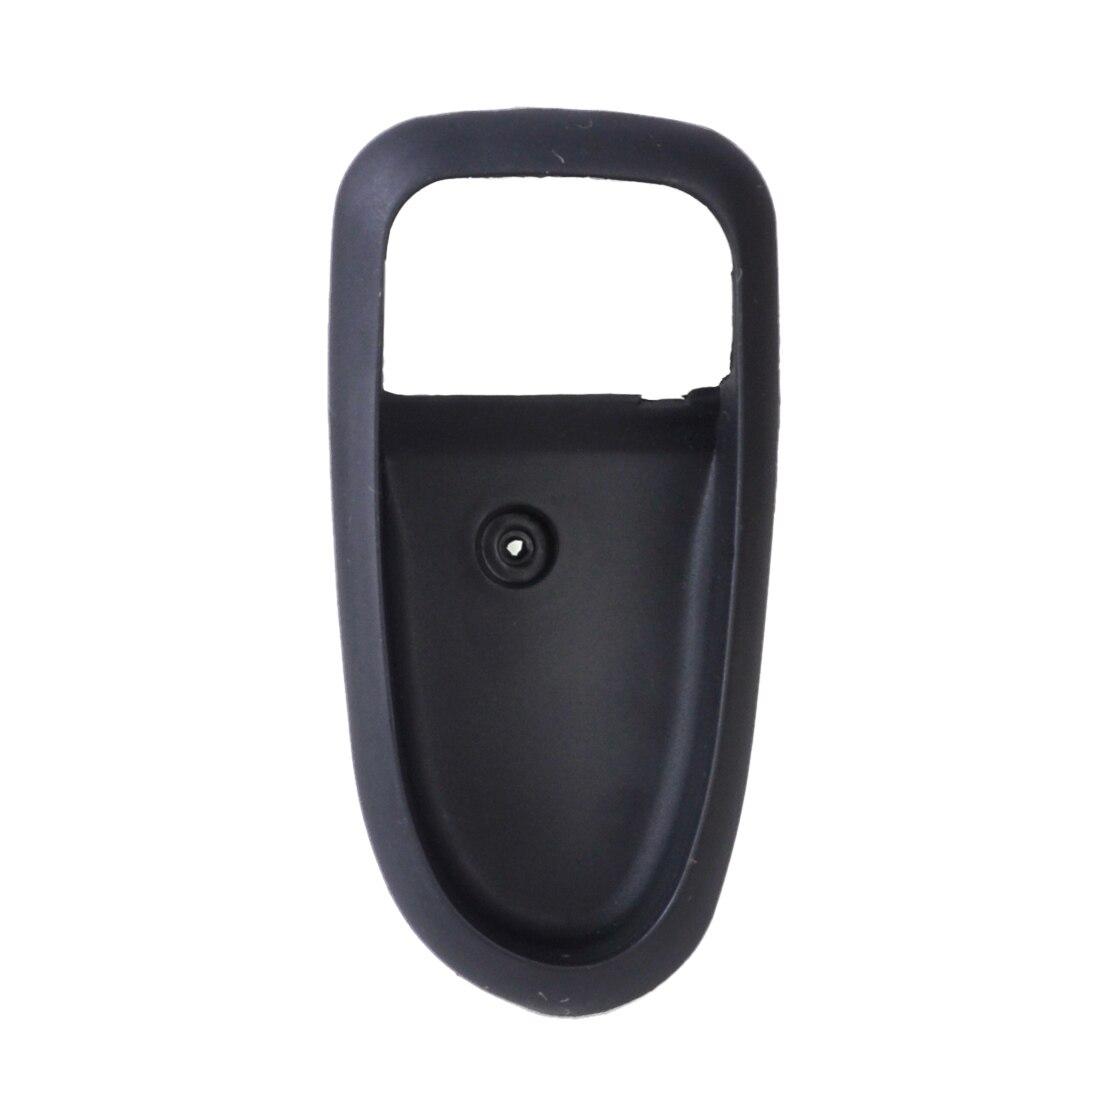 Dwcx New Black Right Inside Interior Door Handle Trim Cover Bezel Housing Assembly For Hyundai